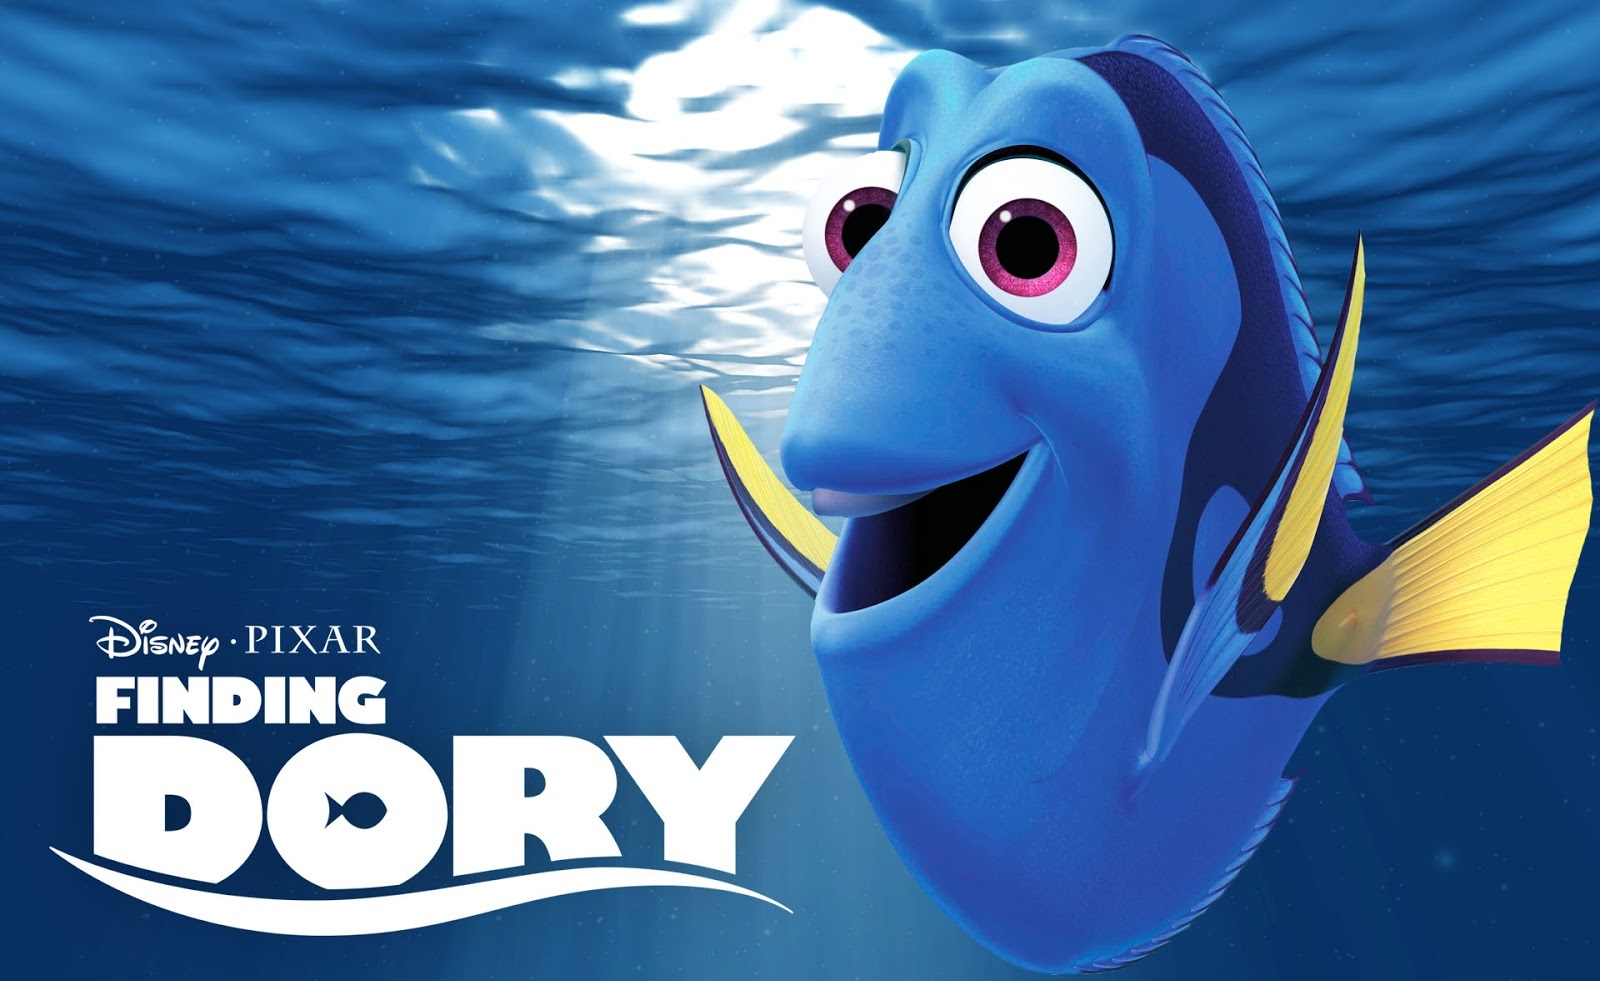 Finding Dory movie - Finding Nemo 2 movie